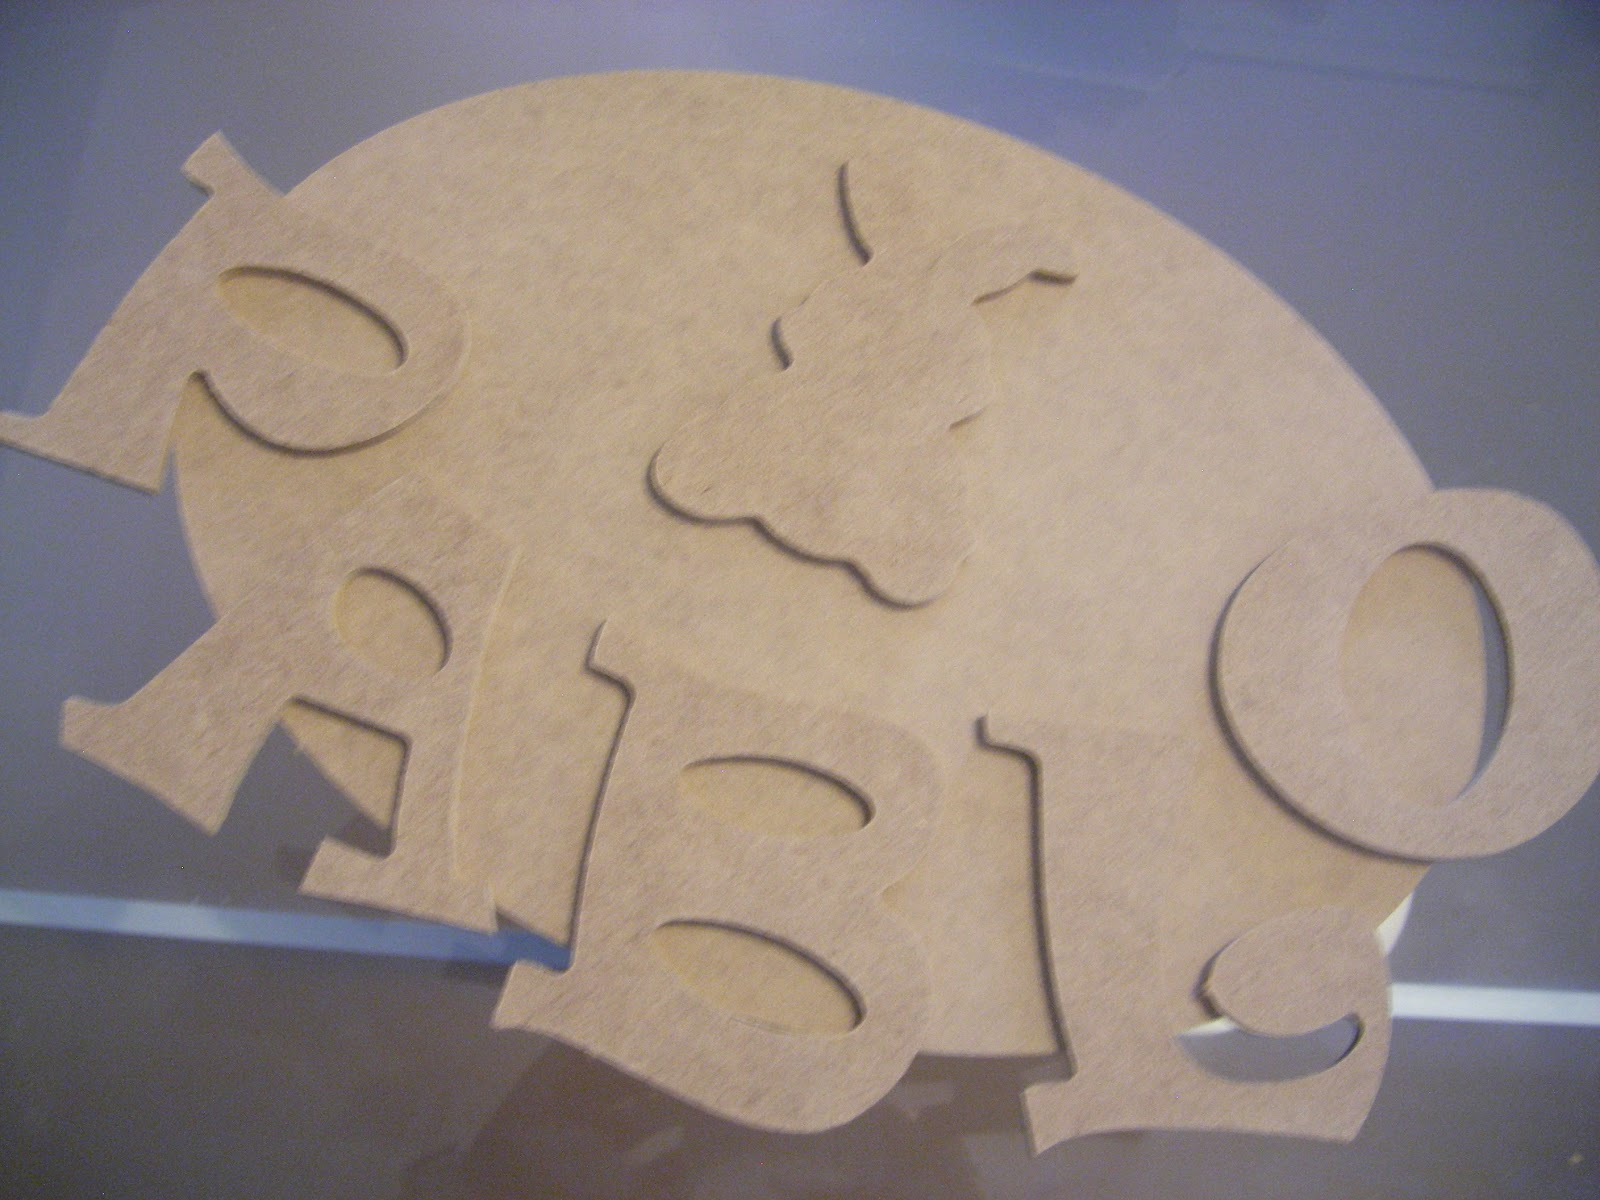 Letras en madera para decorar decoraci n infantil - Manualidades sobre madera ...